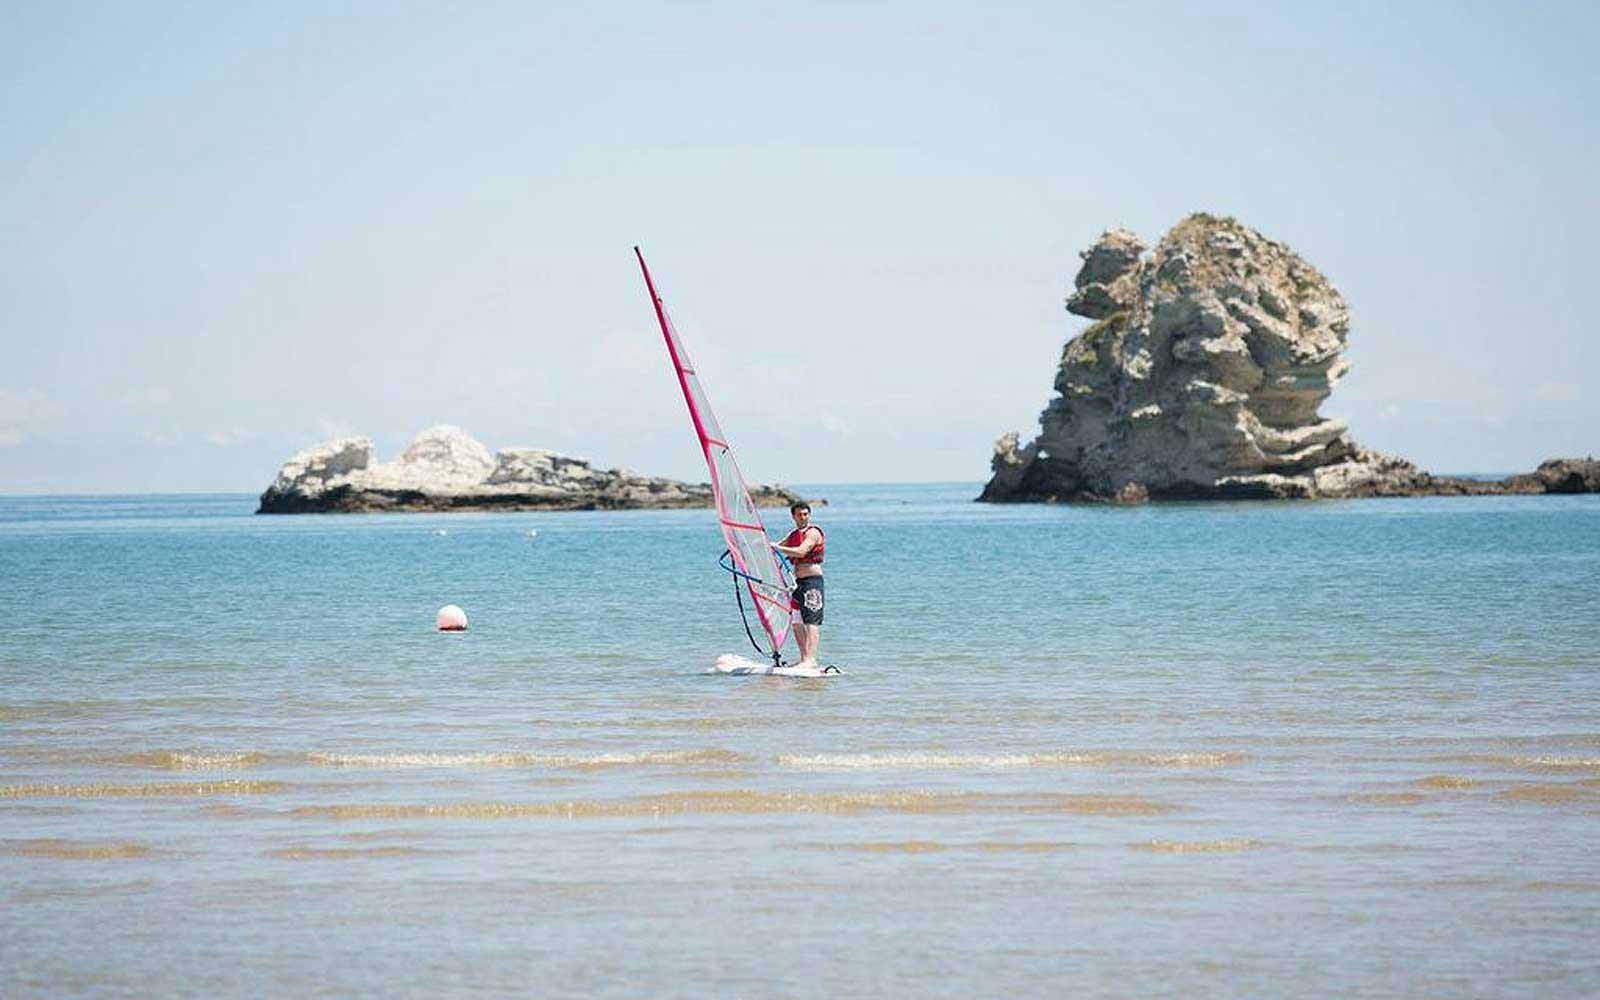 Watersports at the Gattarella Resort